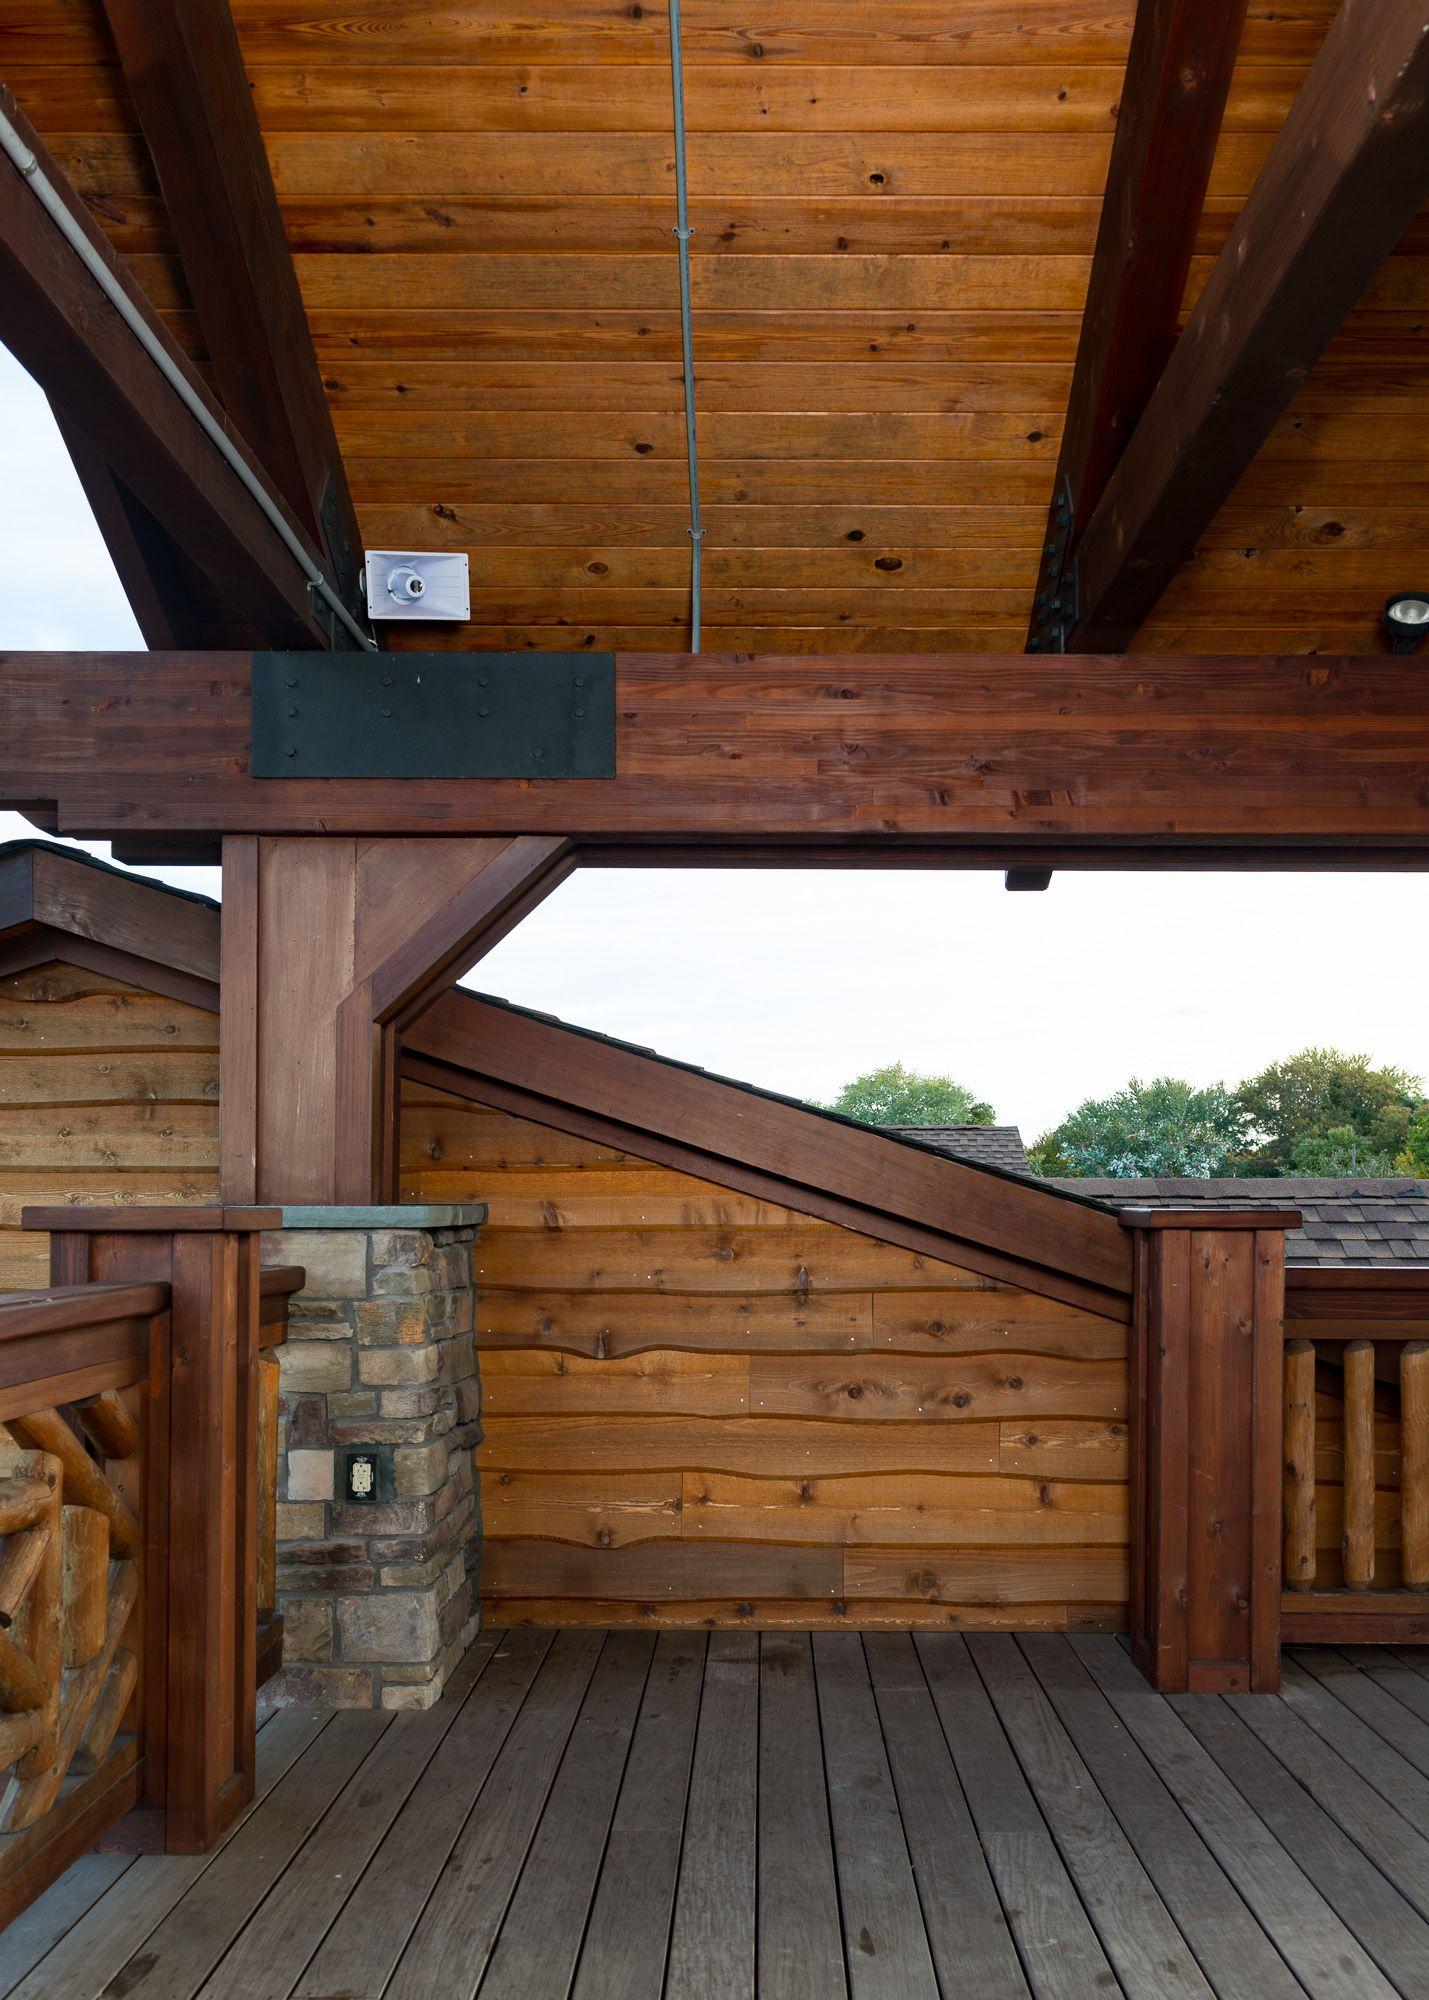 Park Center Wrapped In Our Wavy Edge Bevel Cedar Siding In 2020 Cedar Siding Patio Art Cedar Lumber